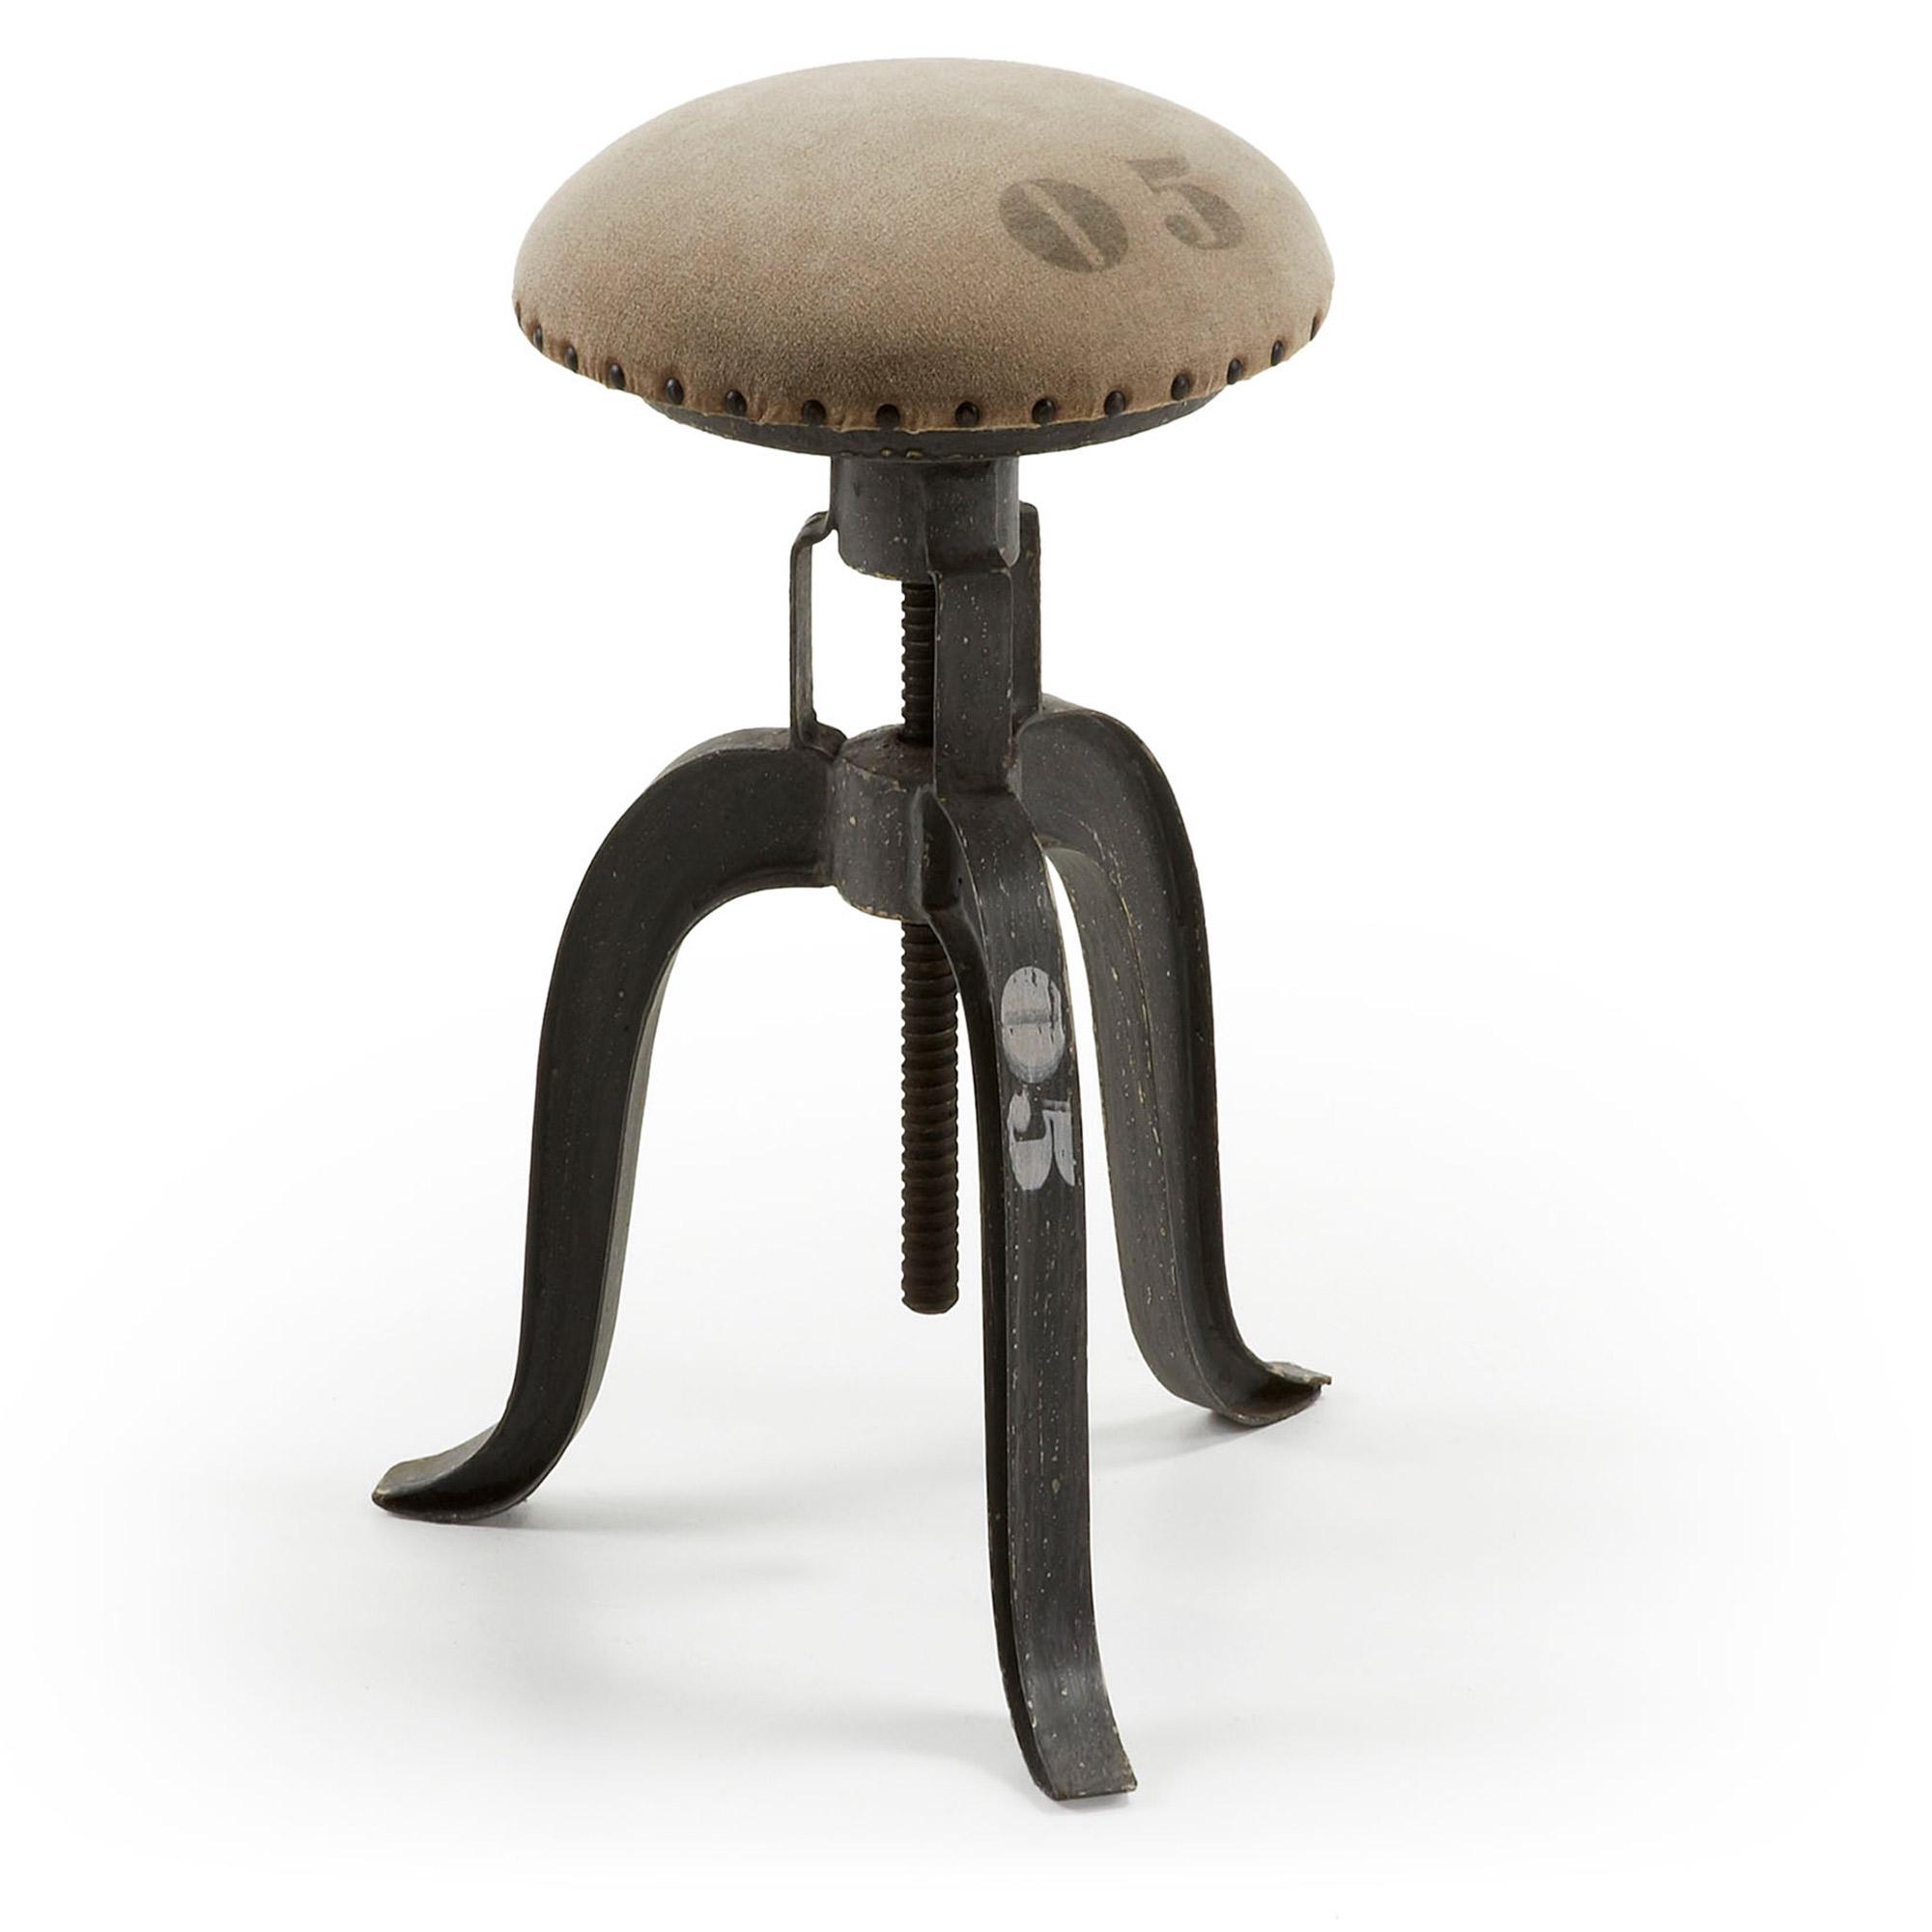 laforma Laforma einner barstol - beige/mørkegrå canvas/metal fra boboonline.dk